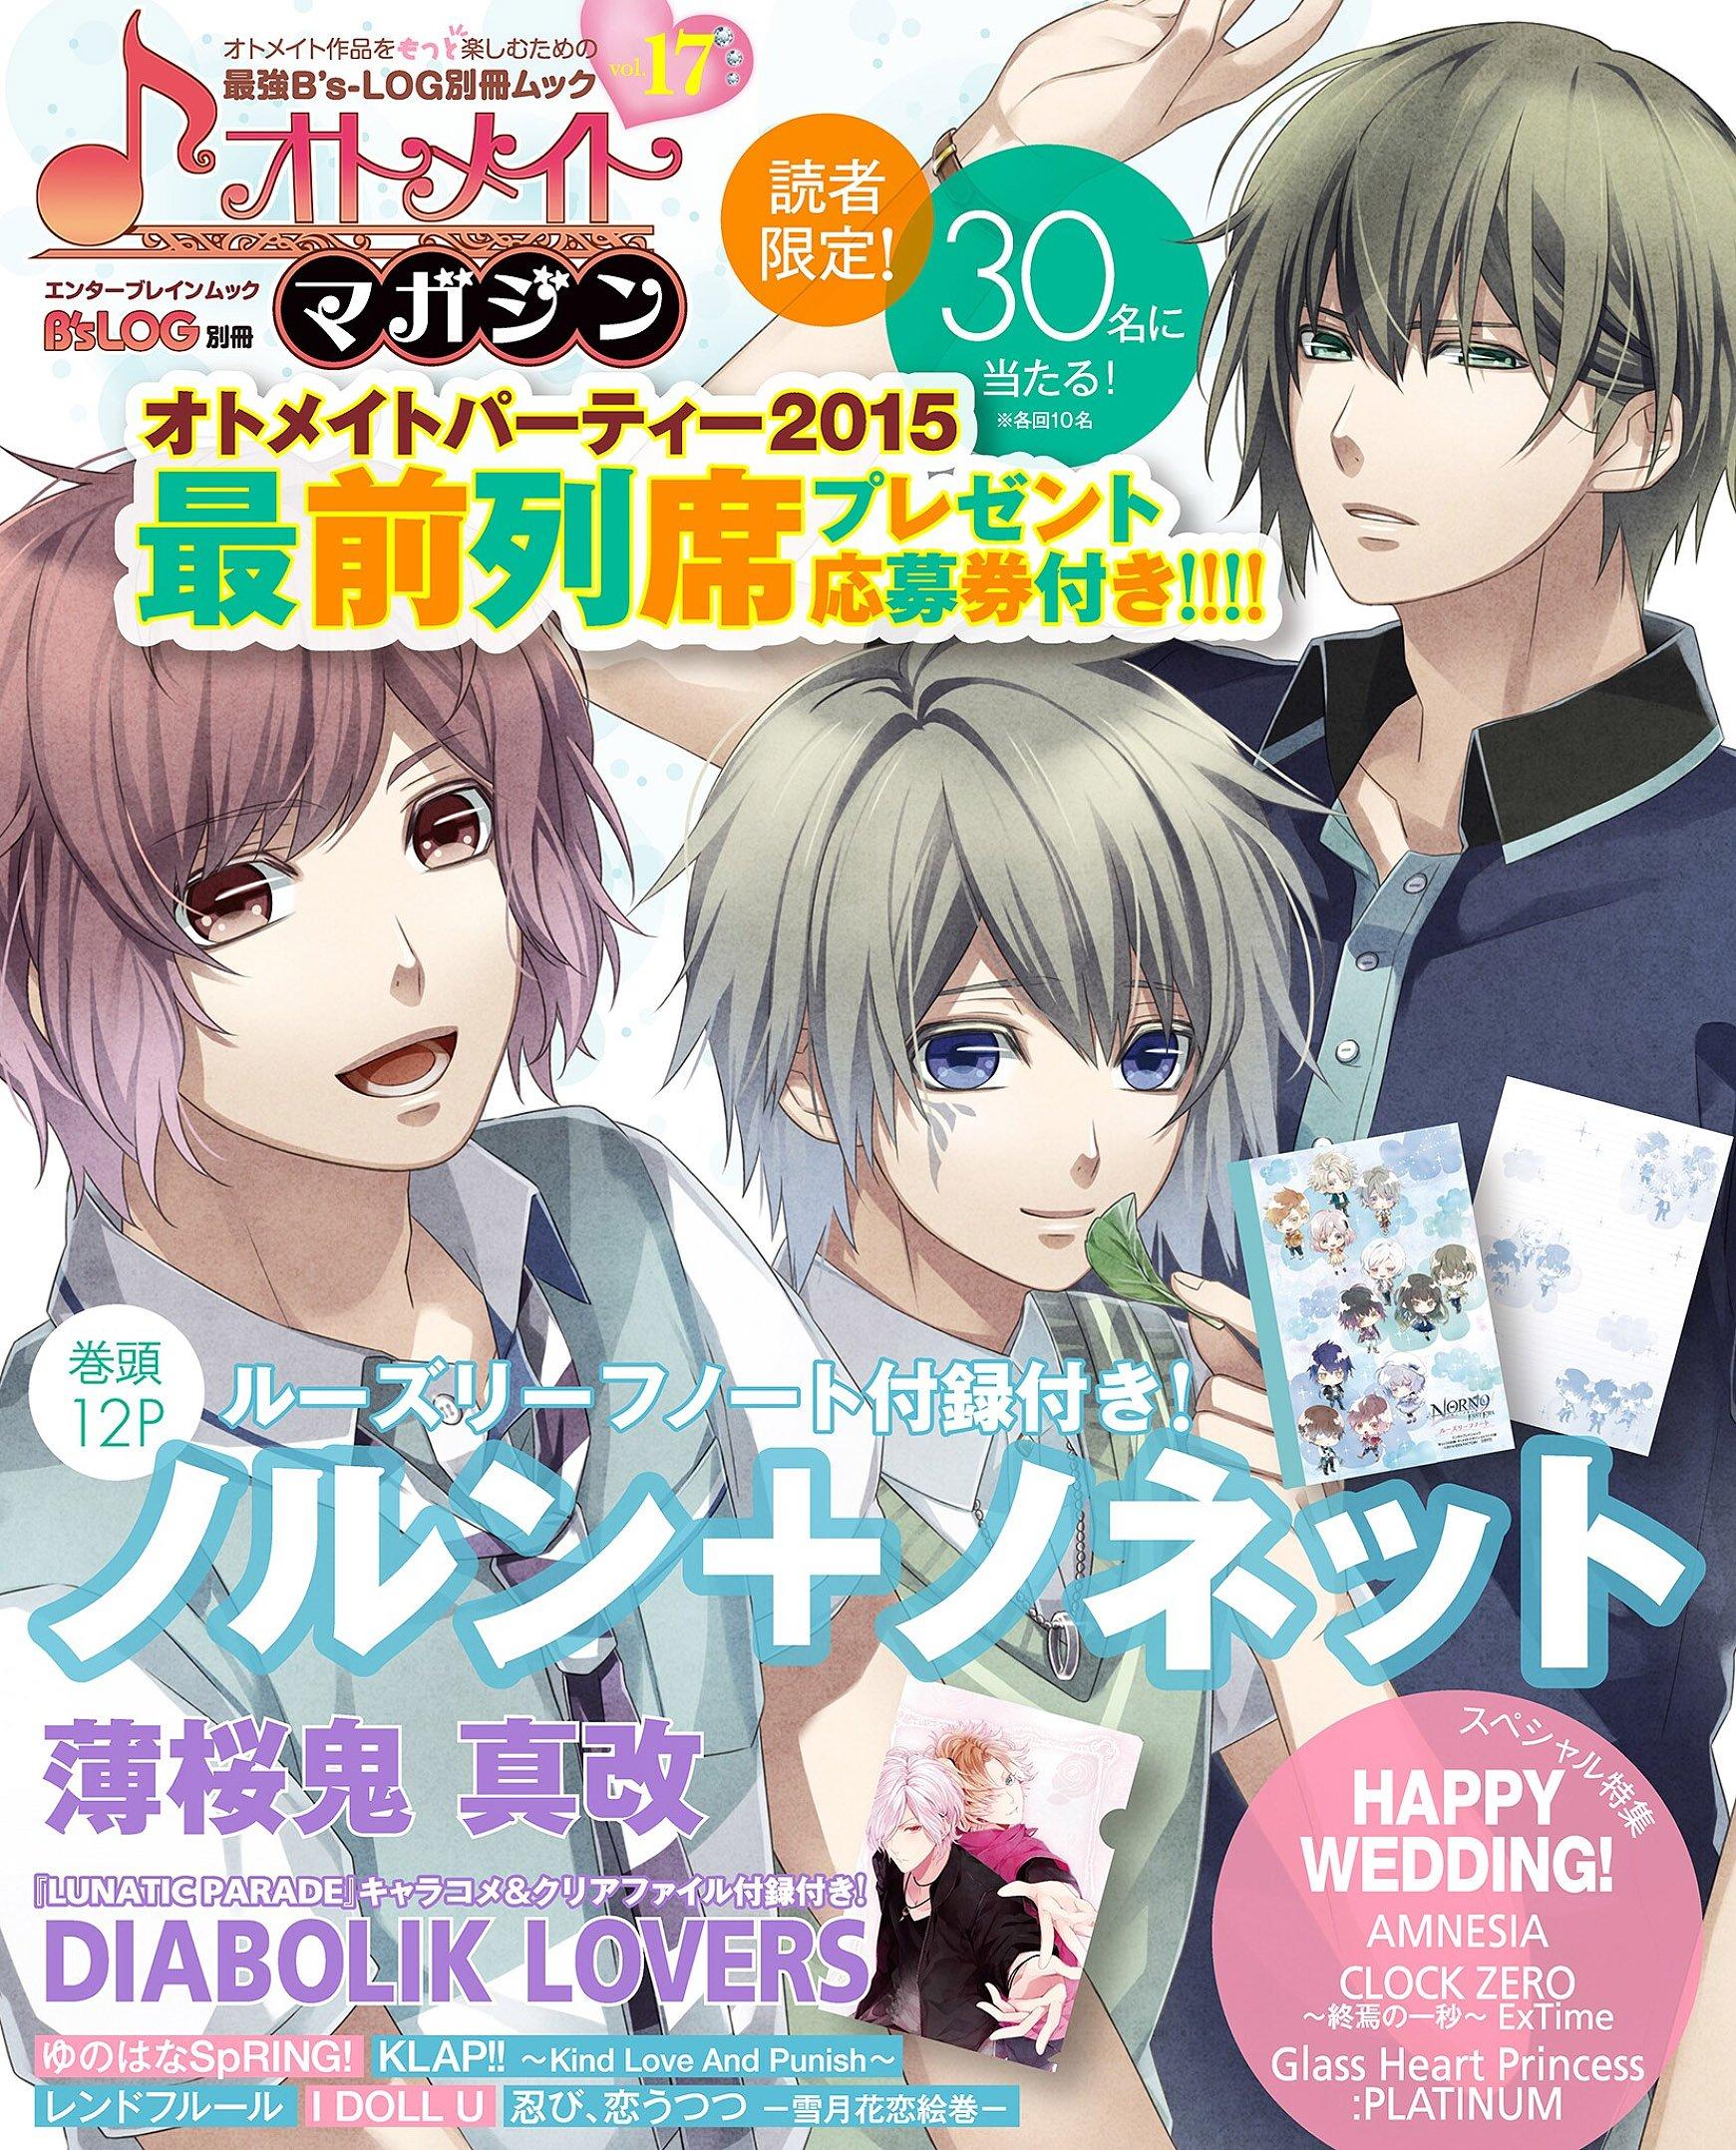 B's-LOG - Otomate Magazine Vol.17 (June 2015)